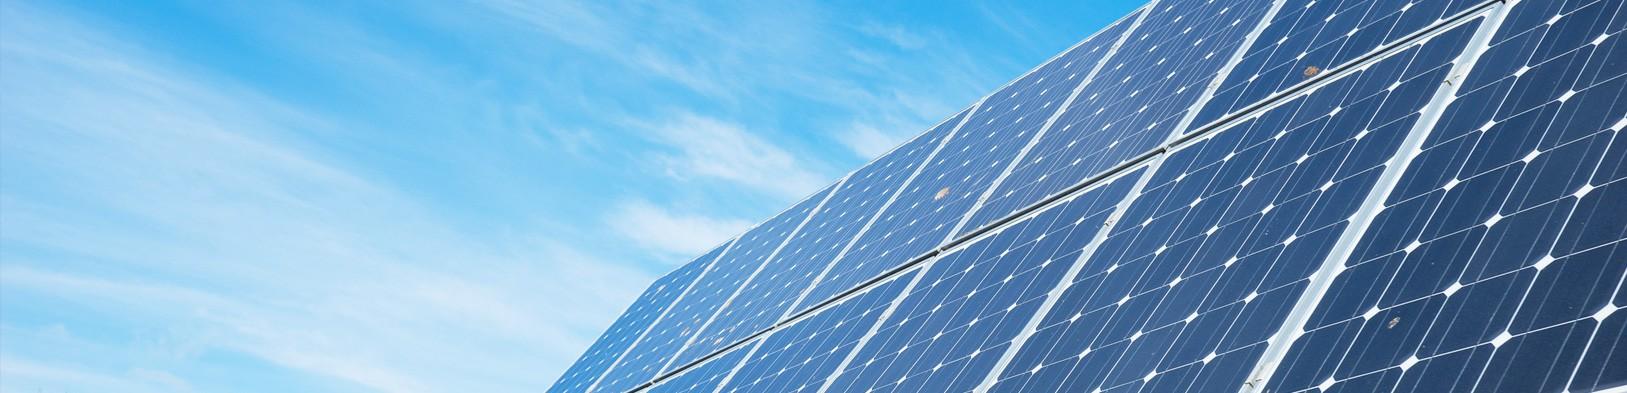 Minister Van 't Wout wil SDE++ subsidie voor    pvt-panelen met warmtepomp